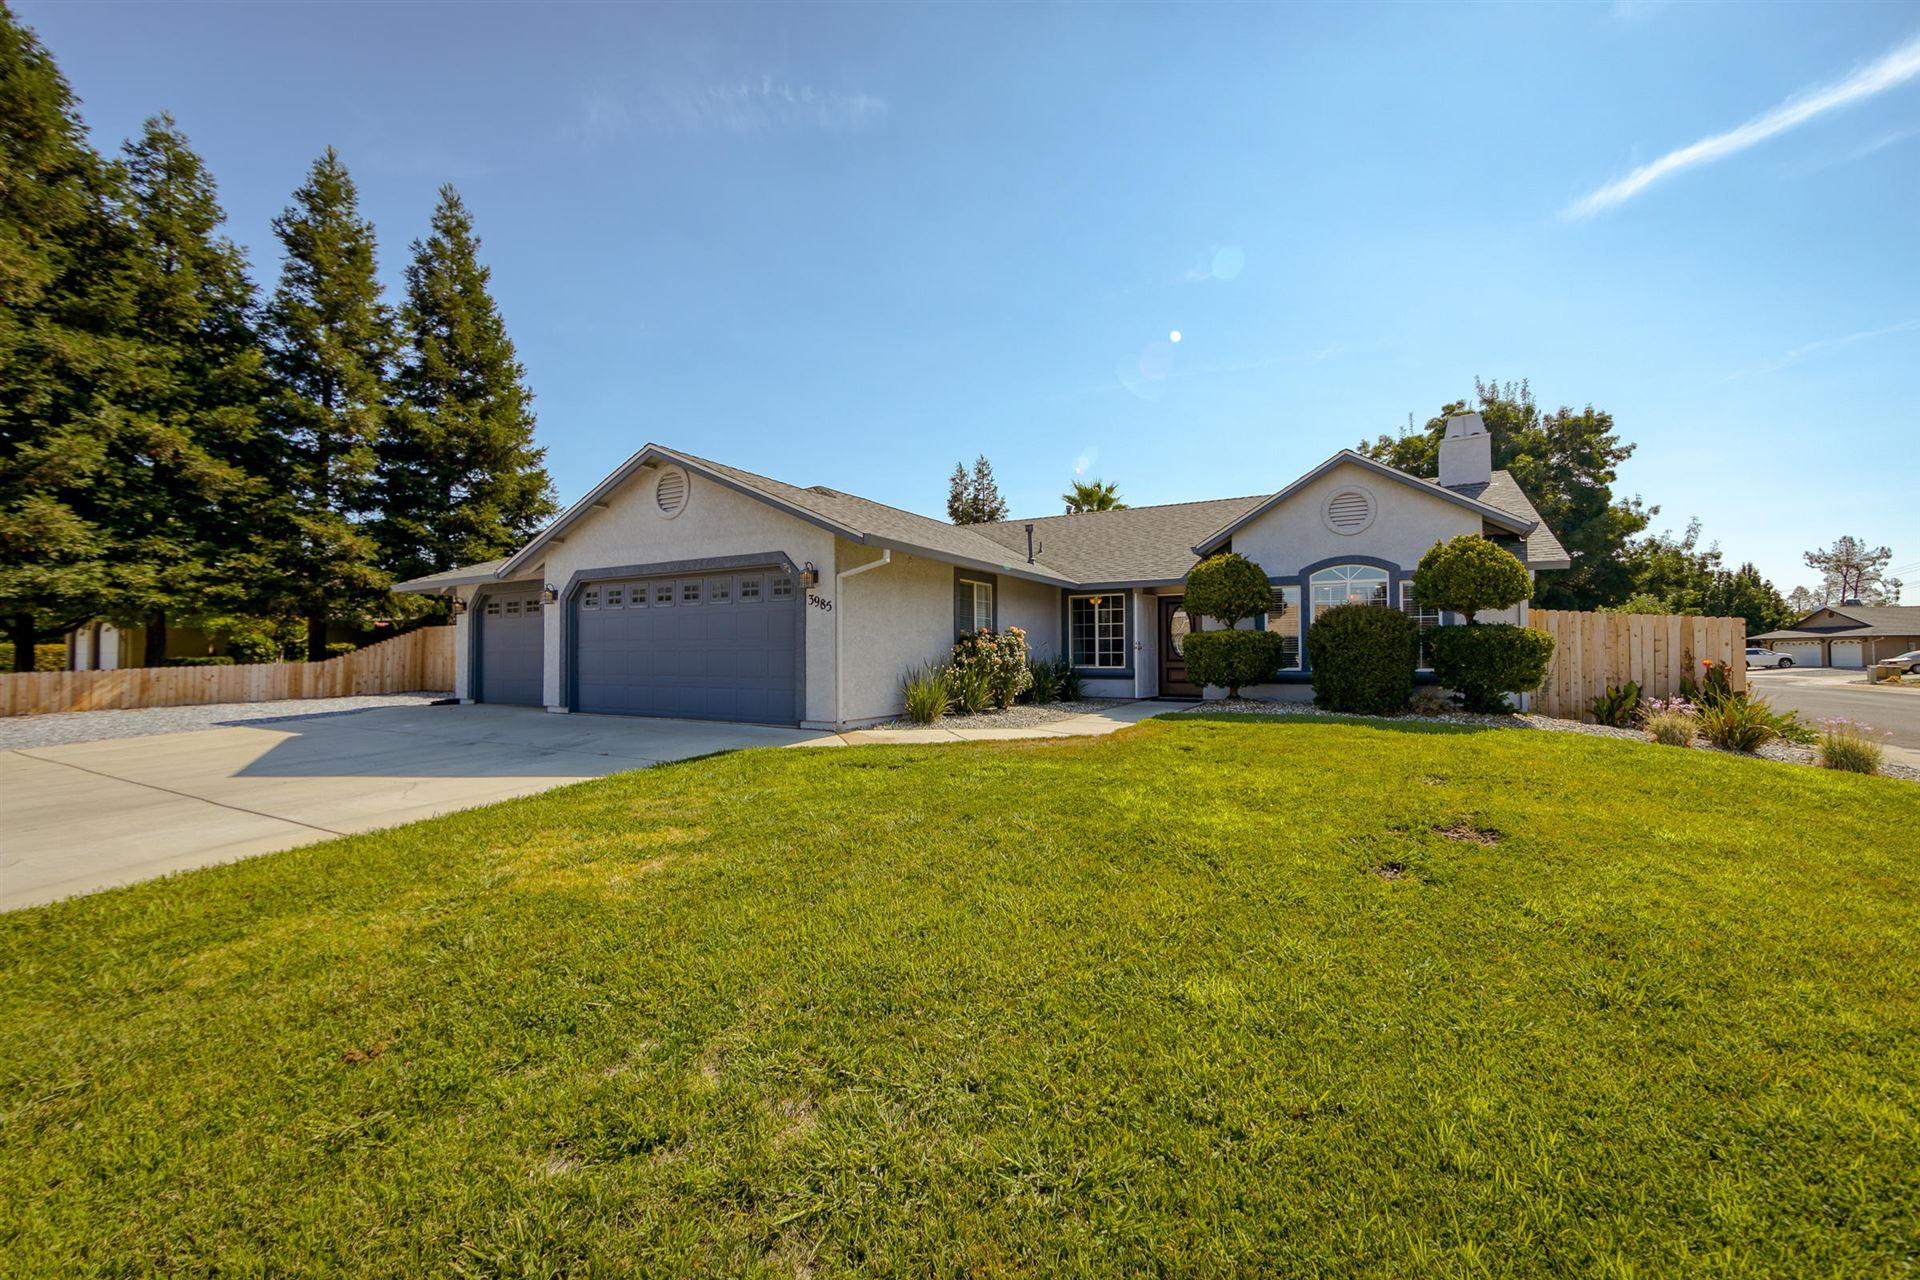 3985 Meadow Oak Way, Redding, CA 96002 - MLS#: 21-3706